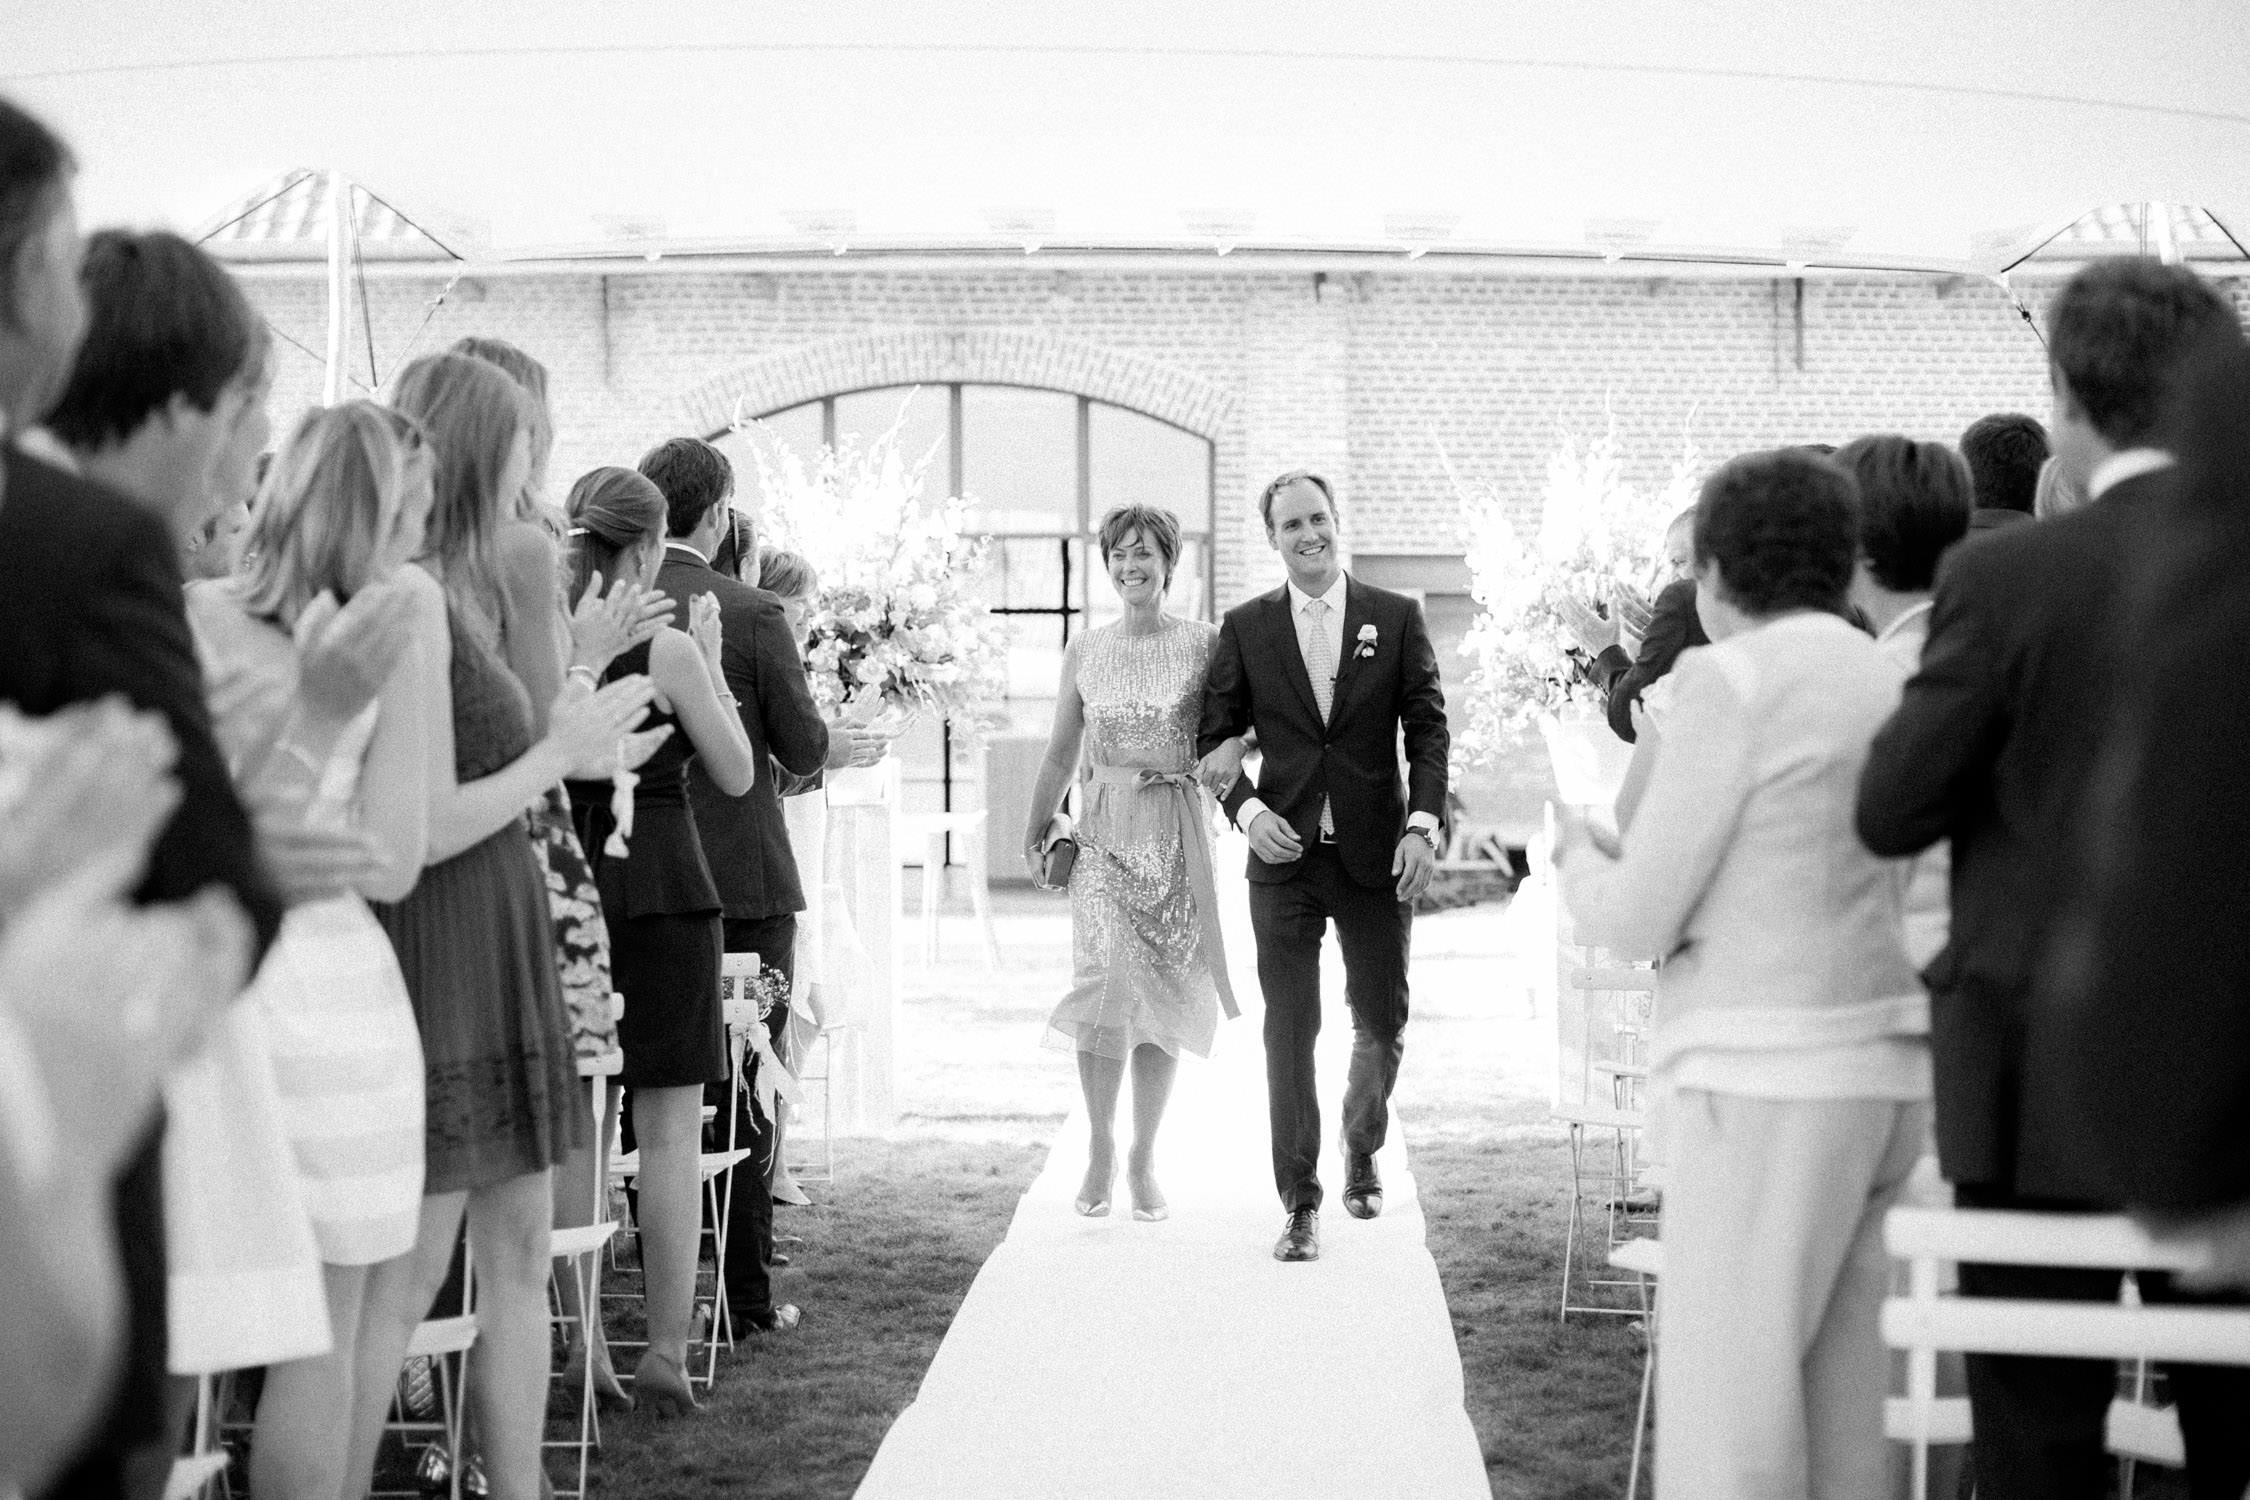 Huwelijksceremonie in 't-Goed Indoye, Wevelgem, mama en bruidegom